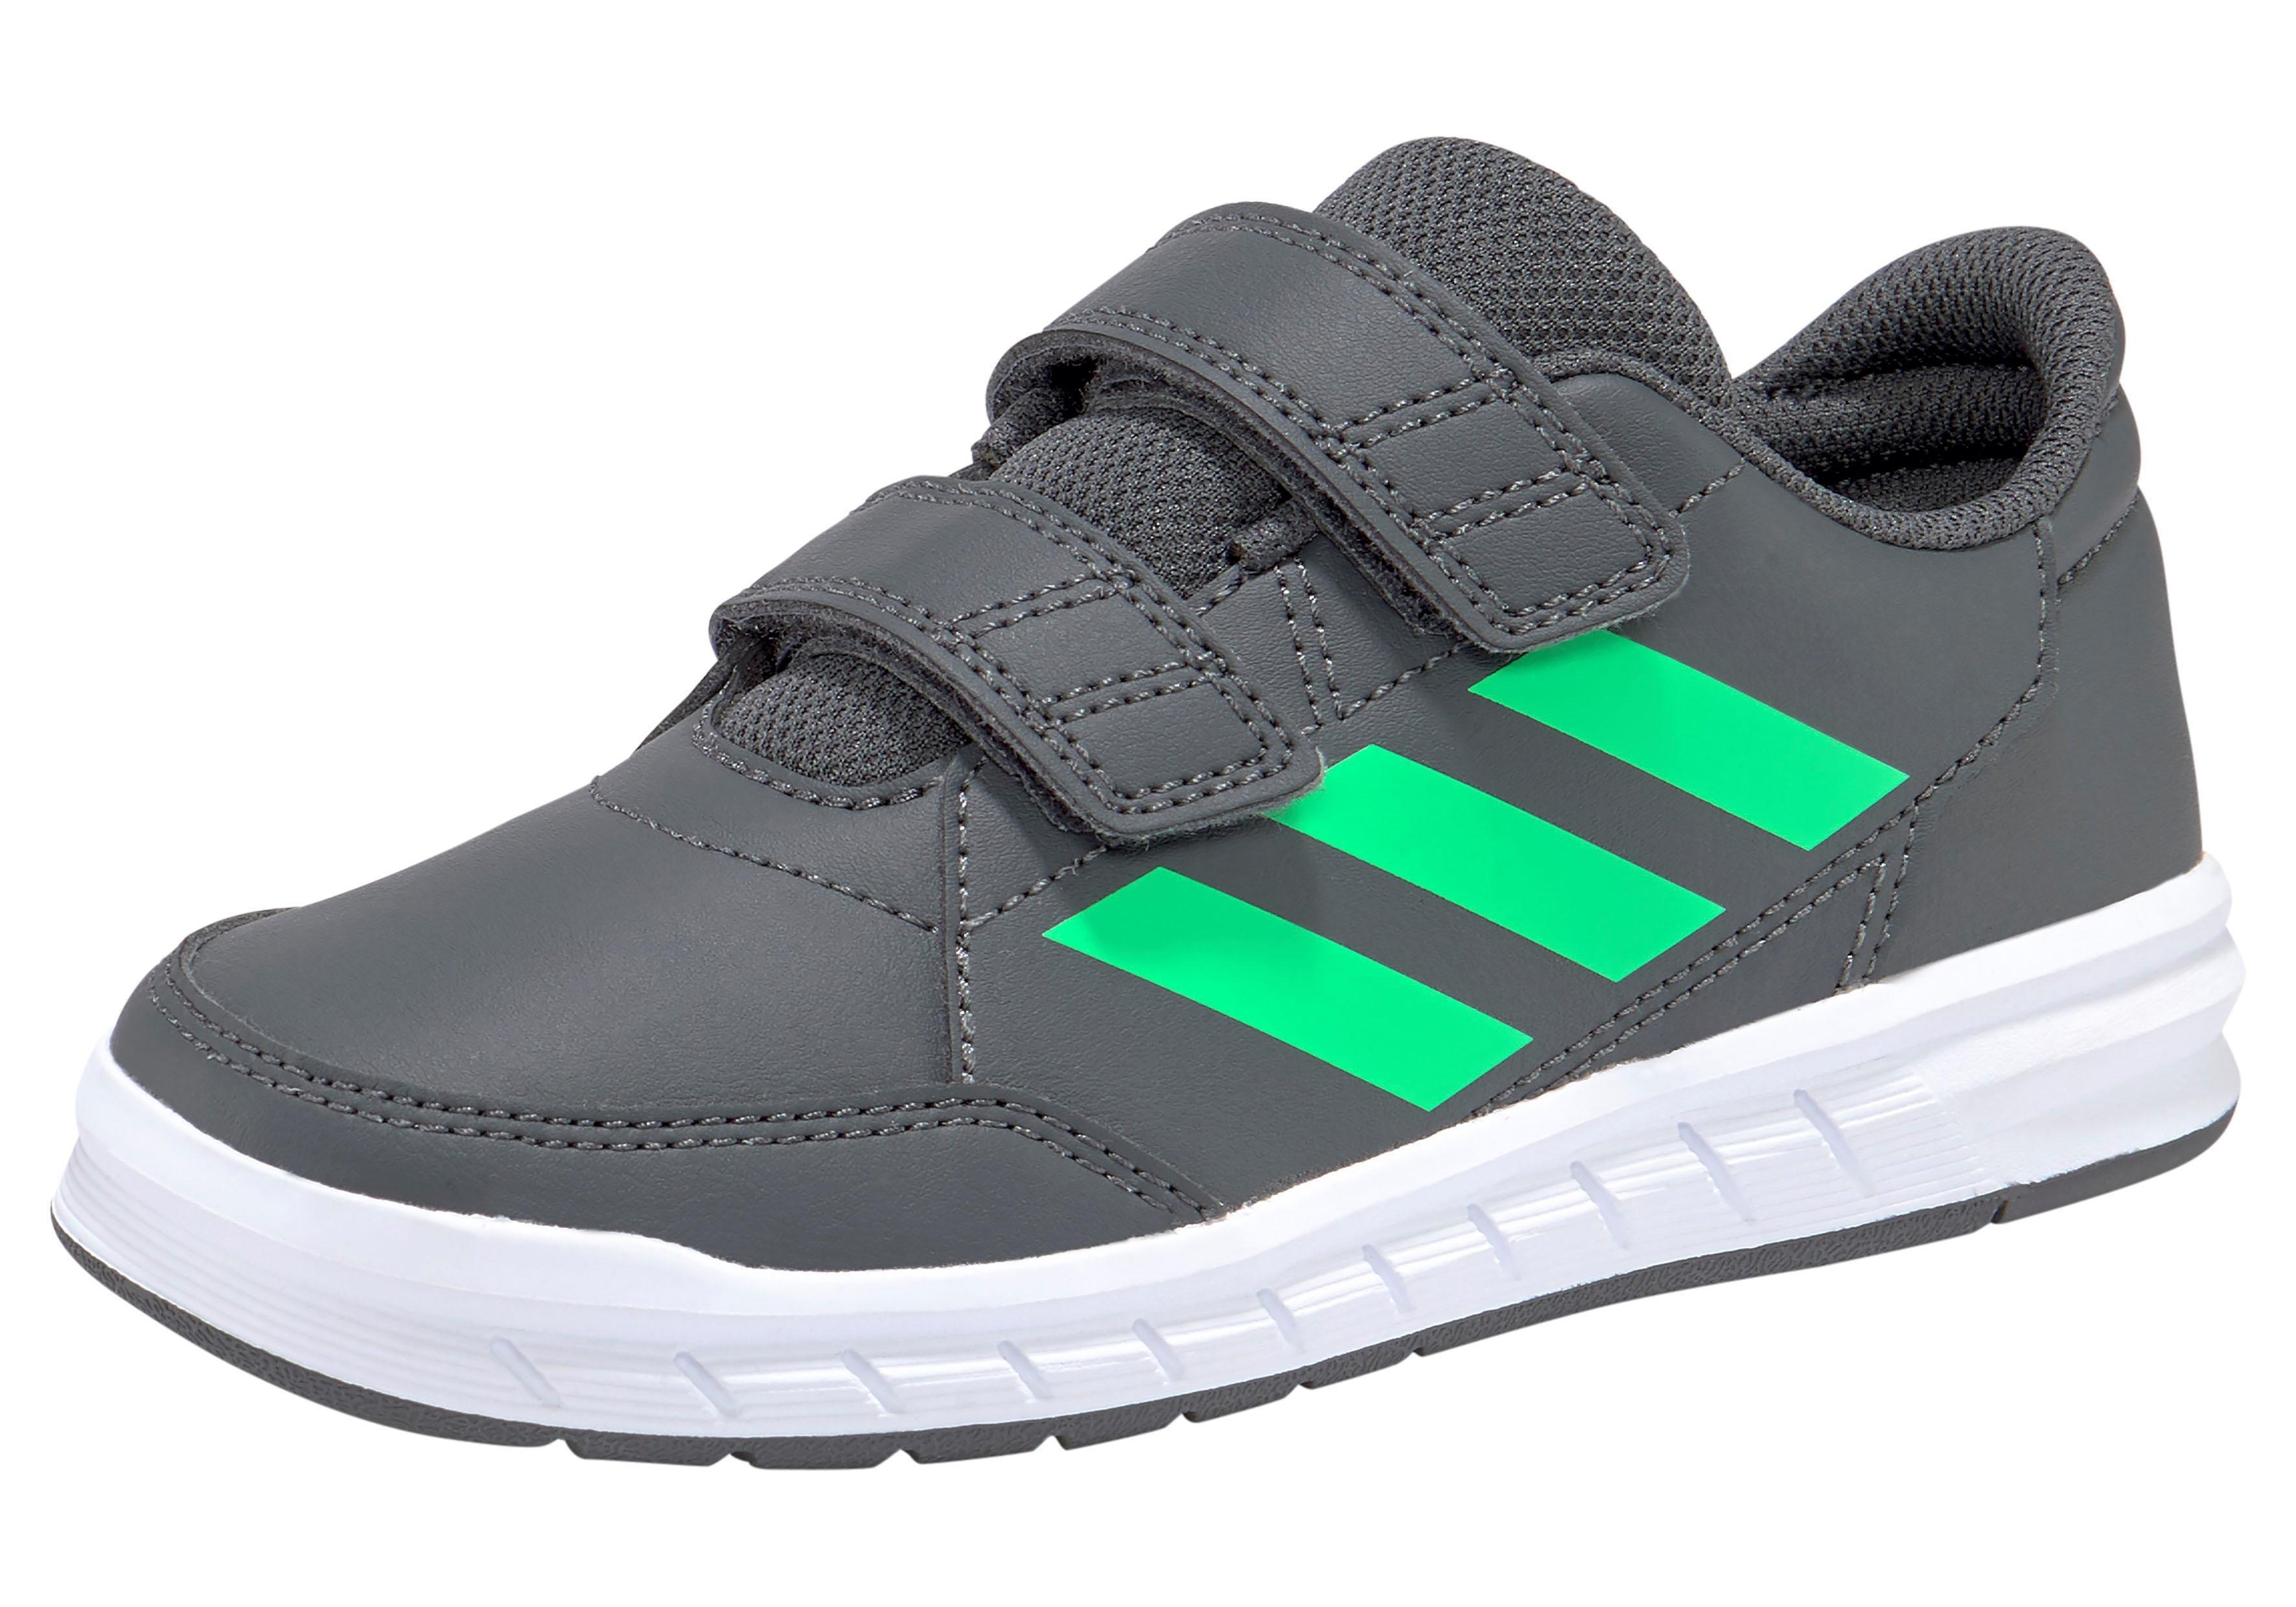 78e9f7be3c4 ... »Outdoorschoenen Ohio High«, NIKE sneakers »Tanjun«, Nike Sportswear  sneakers »Tanjun (tdv)«, adidas Originals sneakers »SUPERSTAR FOUNDATION J«